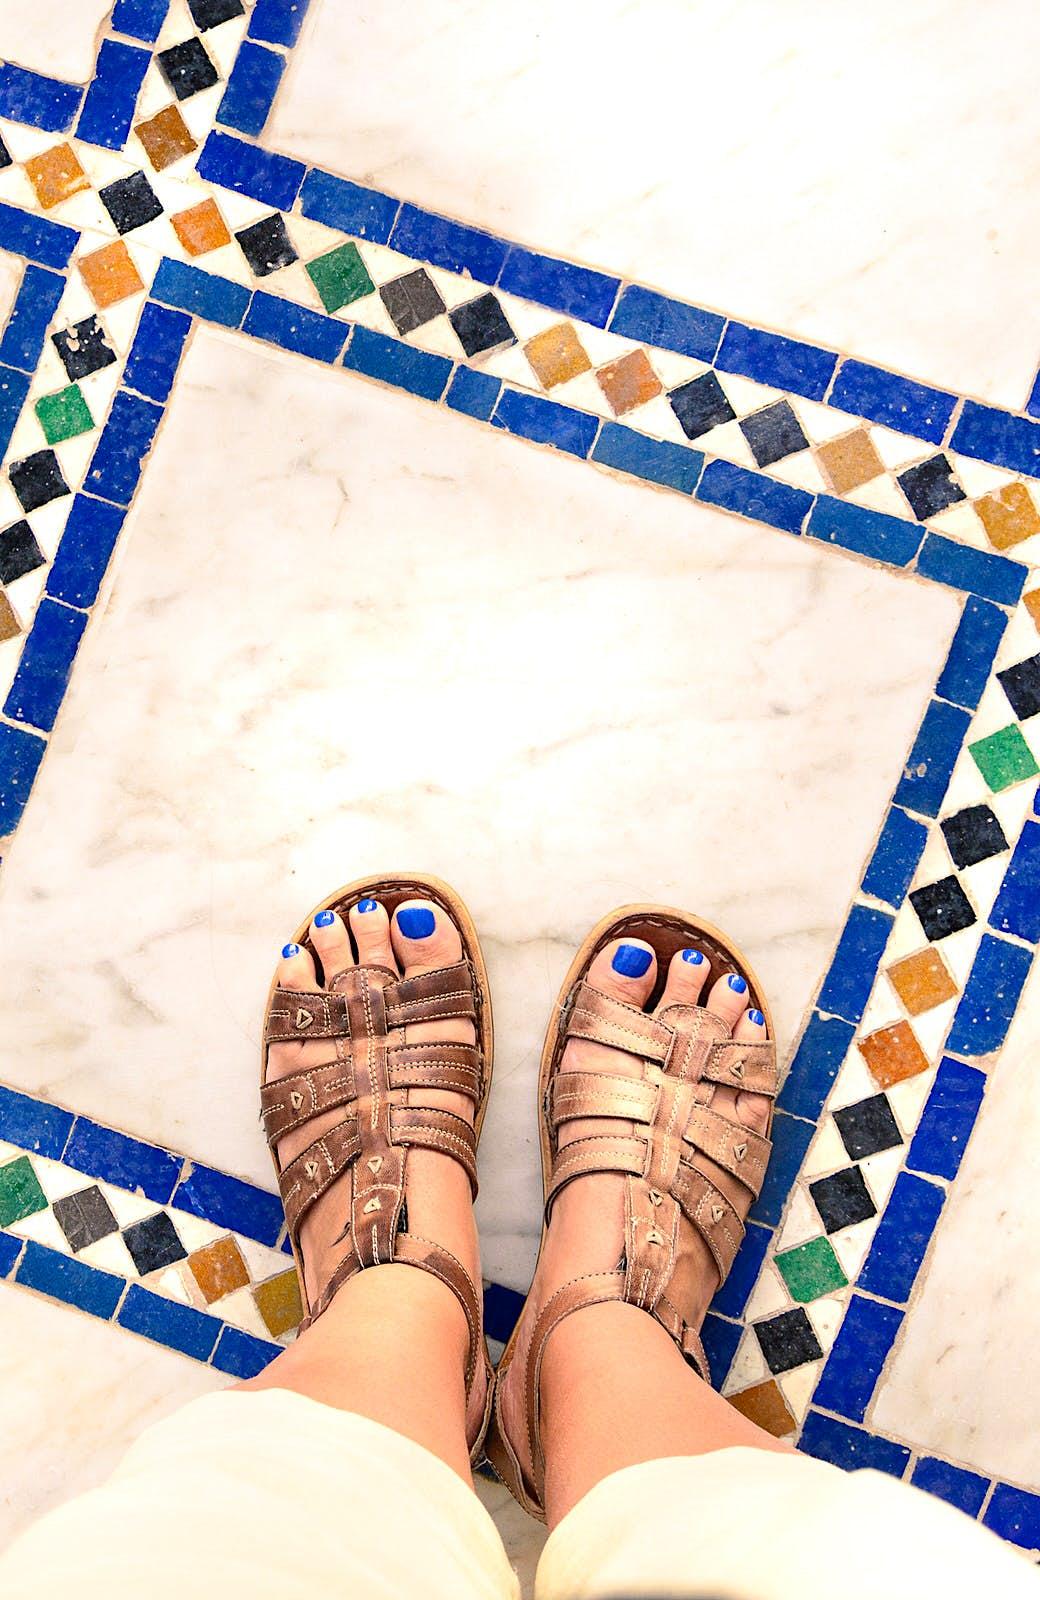 Sandals on North African tiles. Image by Ser Borakovskyy / Shutterstock